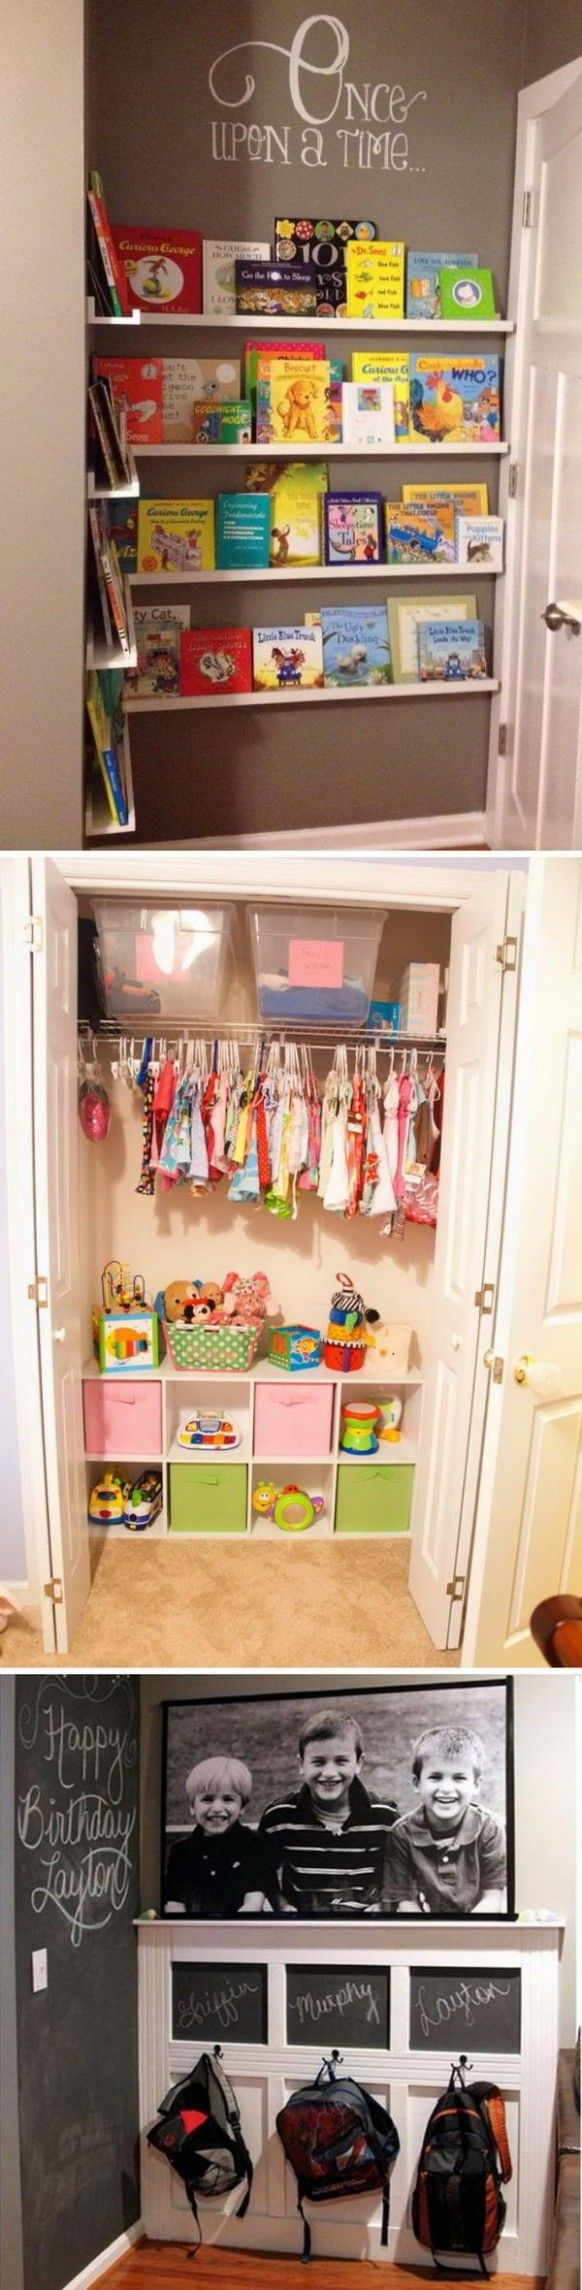 Boy Bedroom Storage Ideas Baby Room Storage Kids Rooms Diy Bookshelves Diy Room storage ideas pinterest